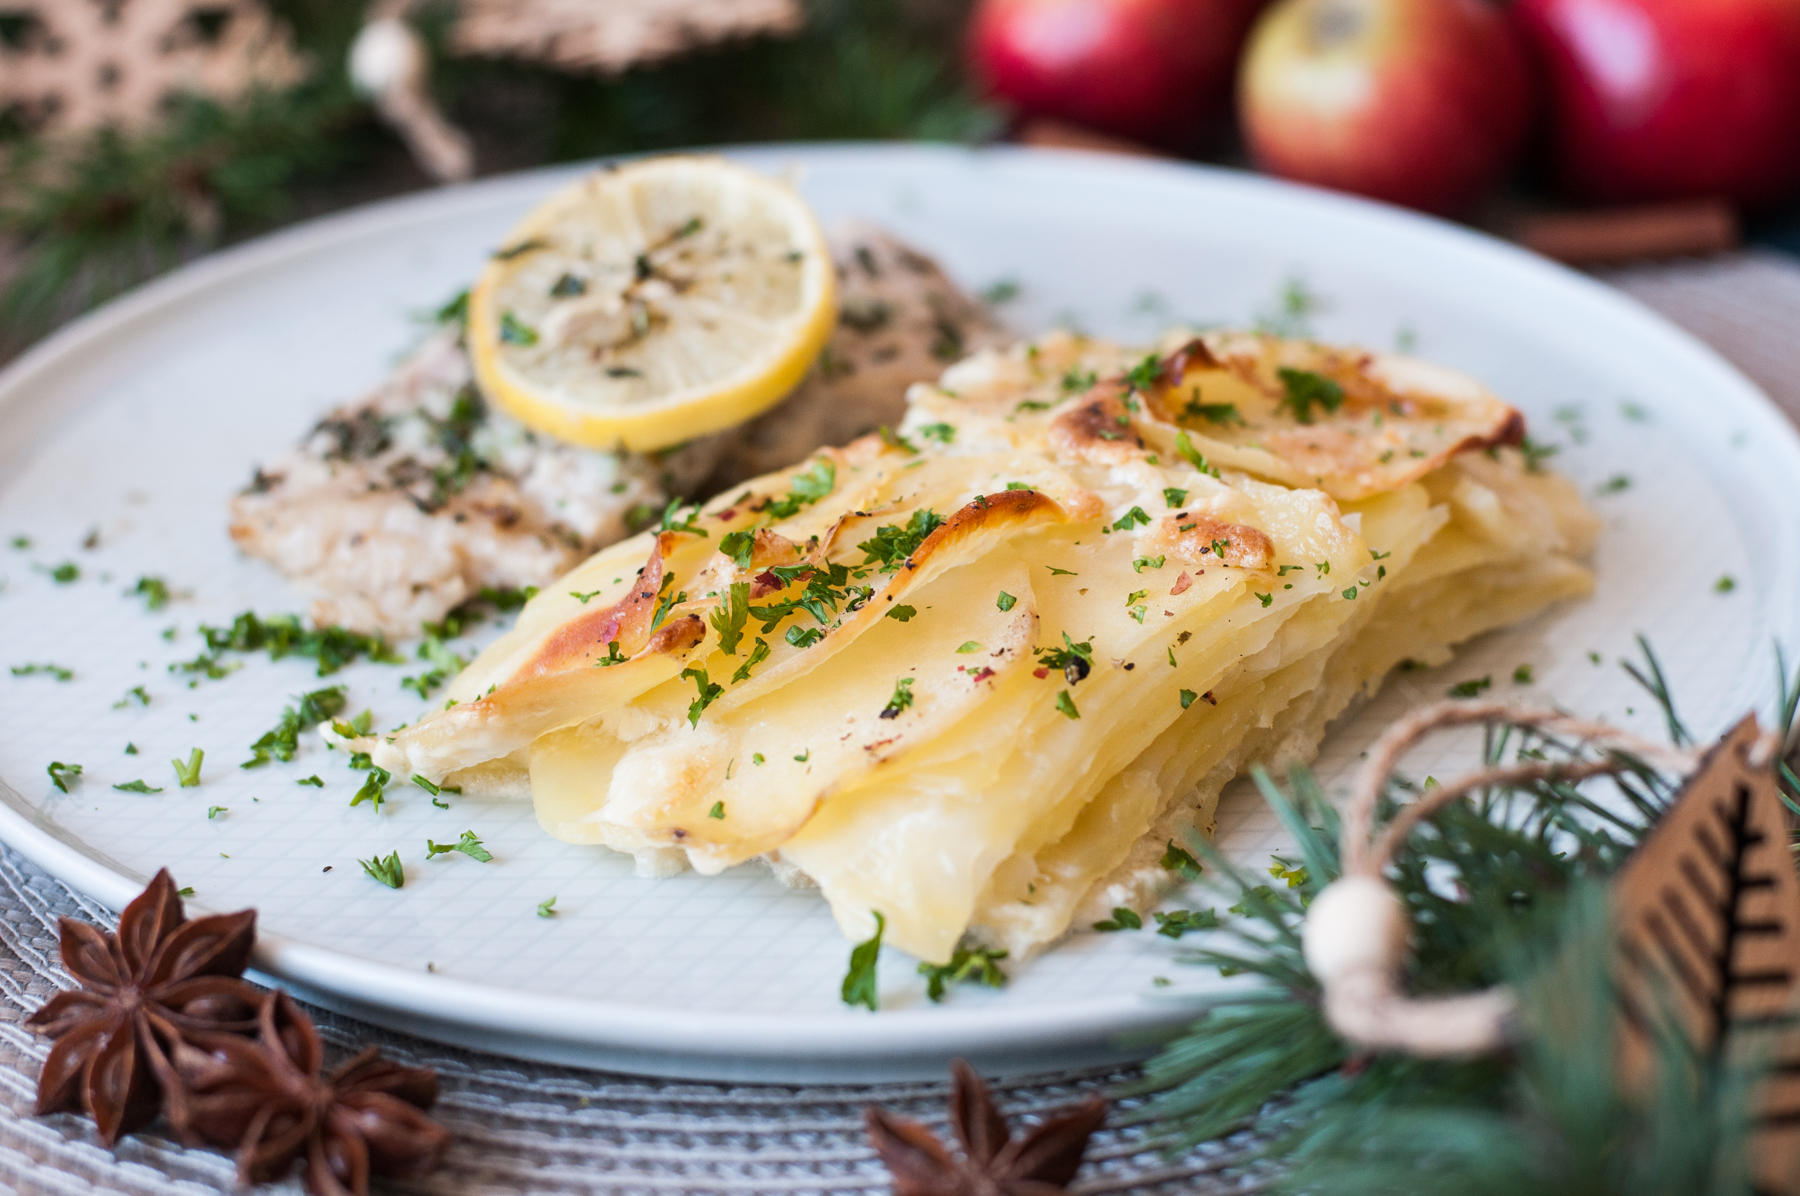 Kapr pečený na bylinkách a gratinované brambory